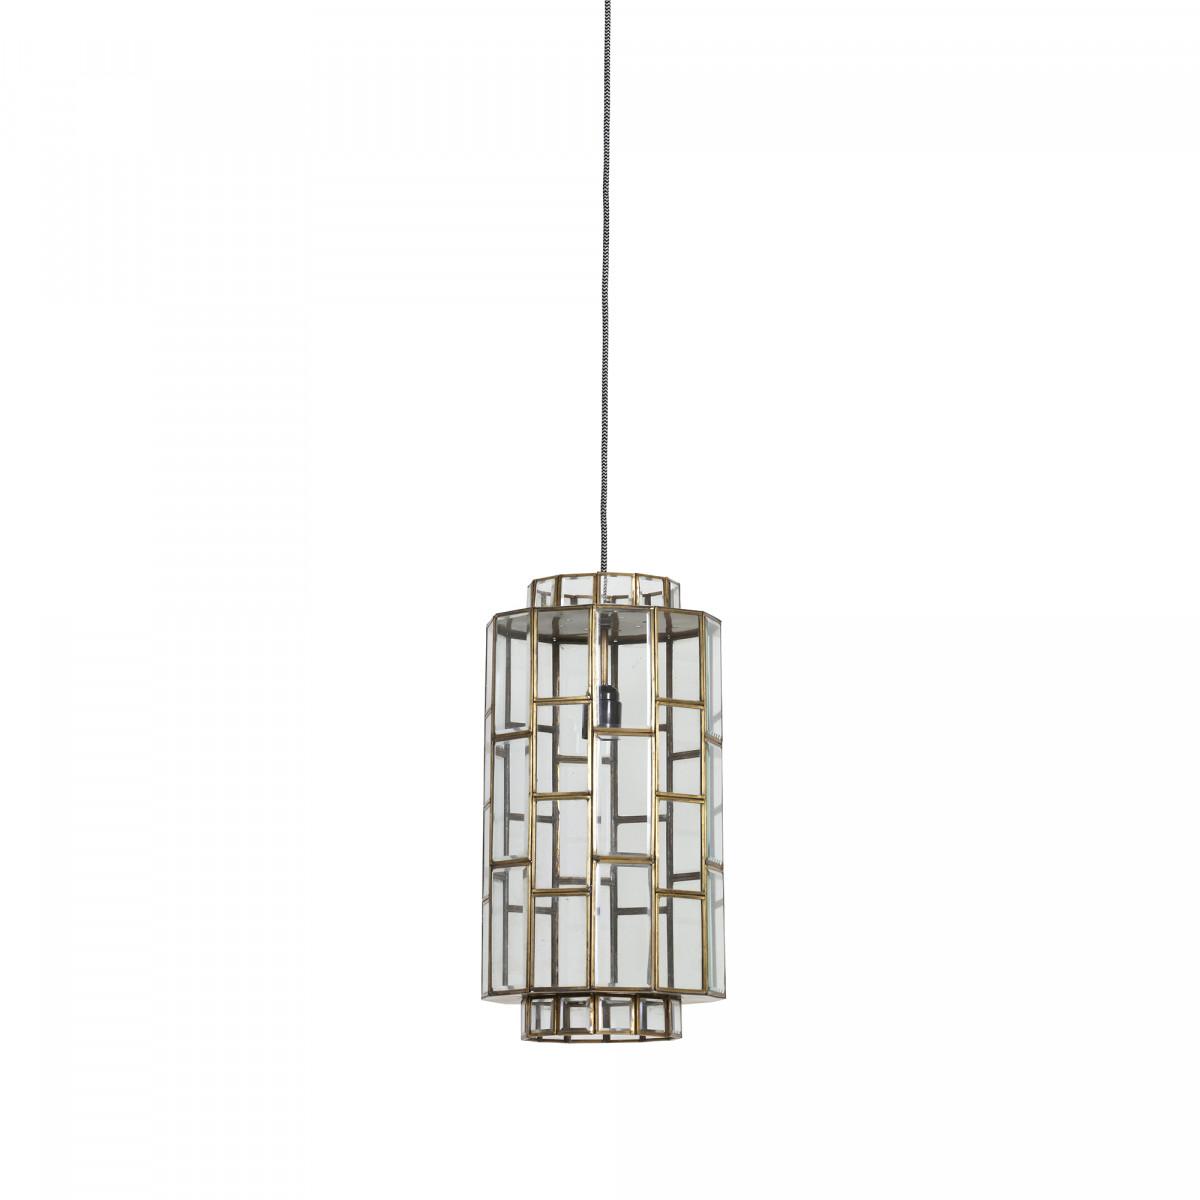 Hanglamp Sostrene antiek brons/glas